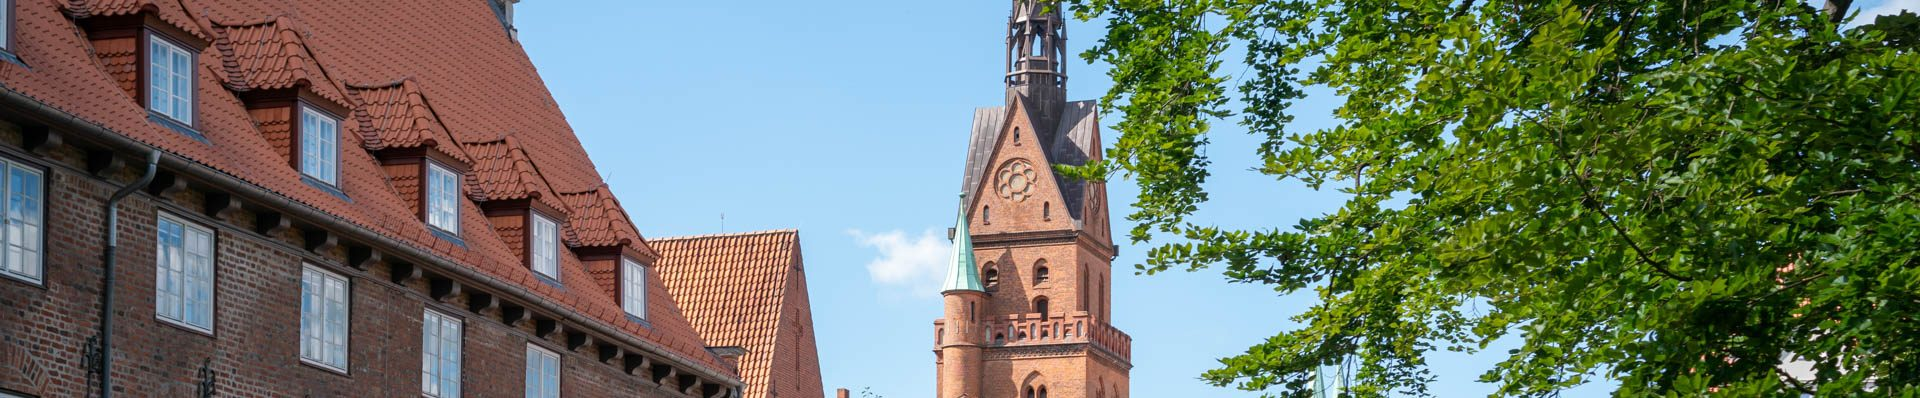 Category: Schleswig-Holstein